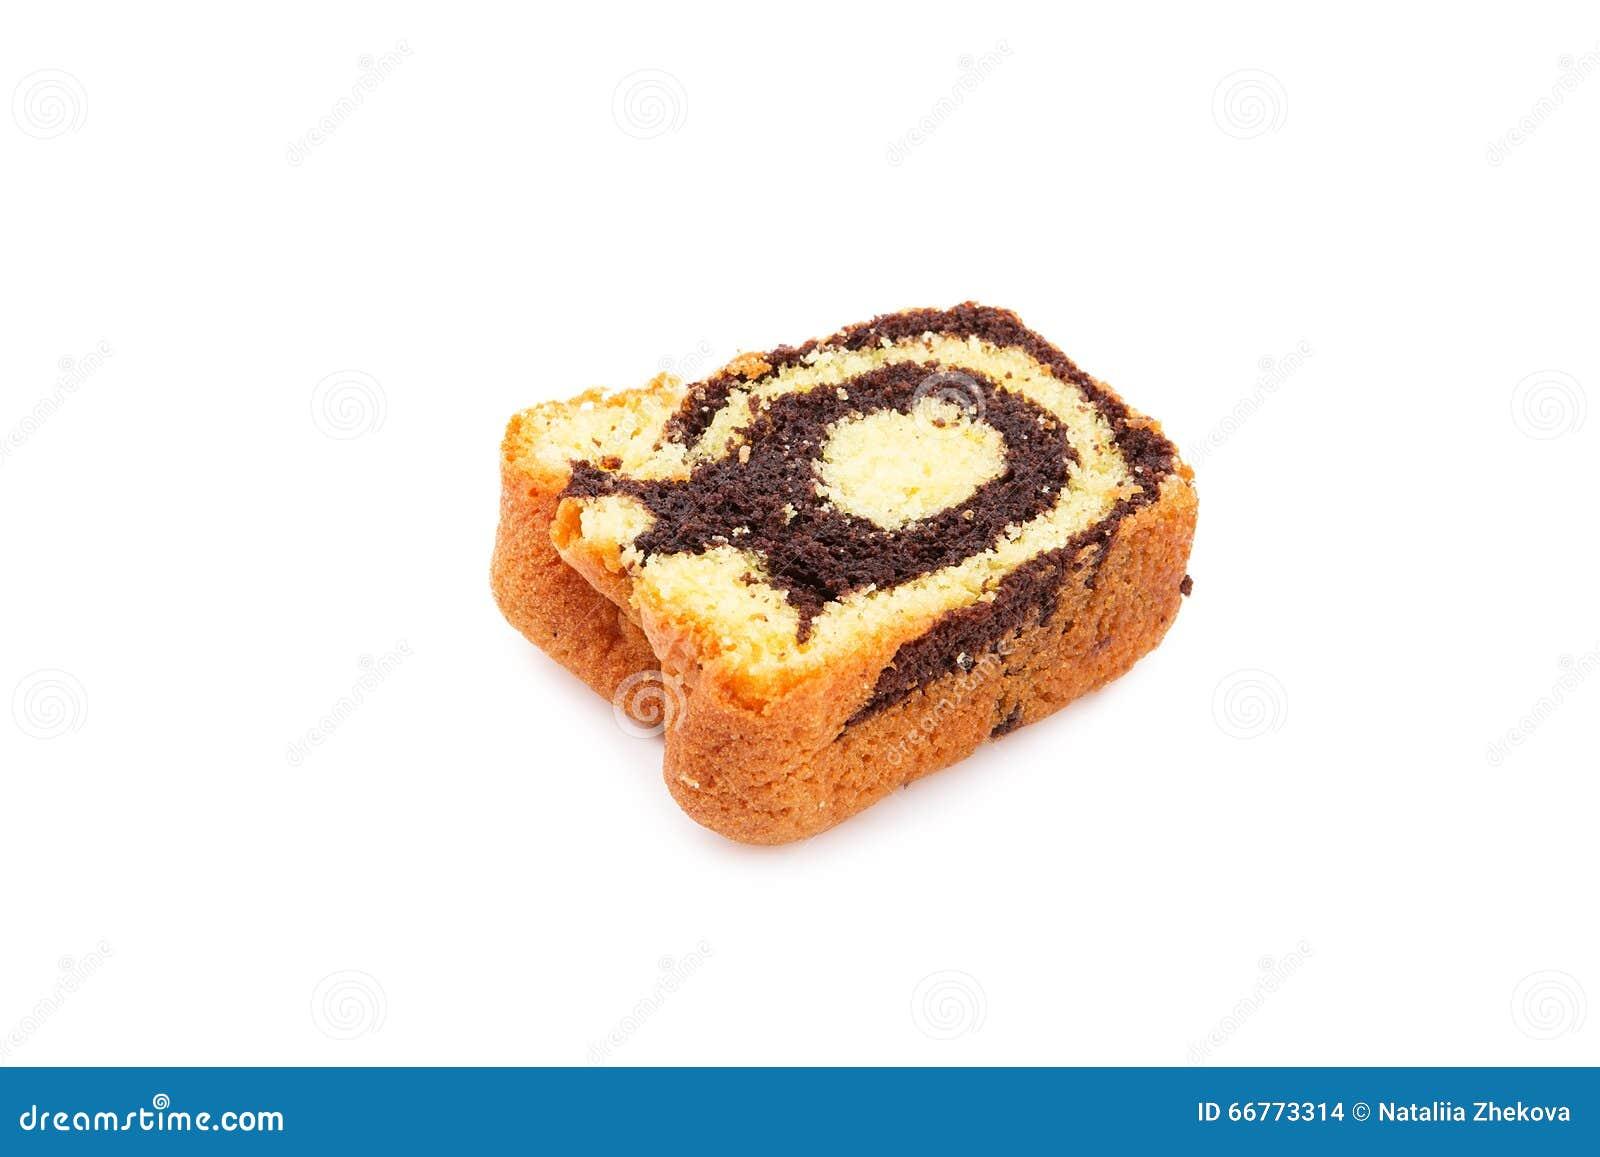 Chocolate Marble Coffee Cake